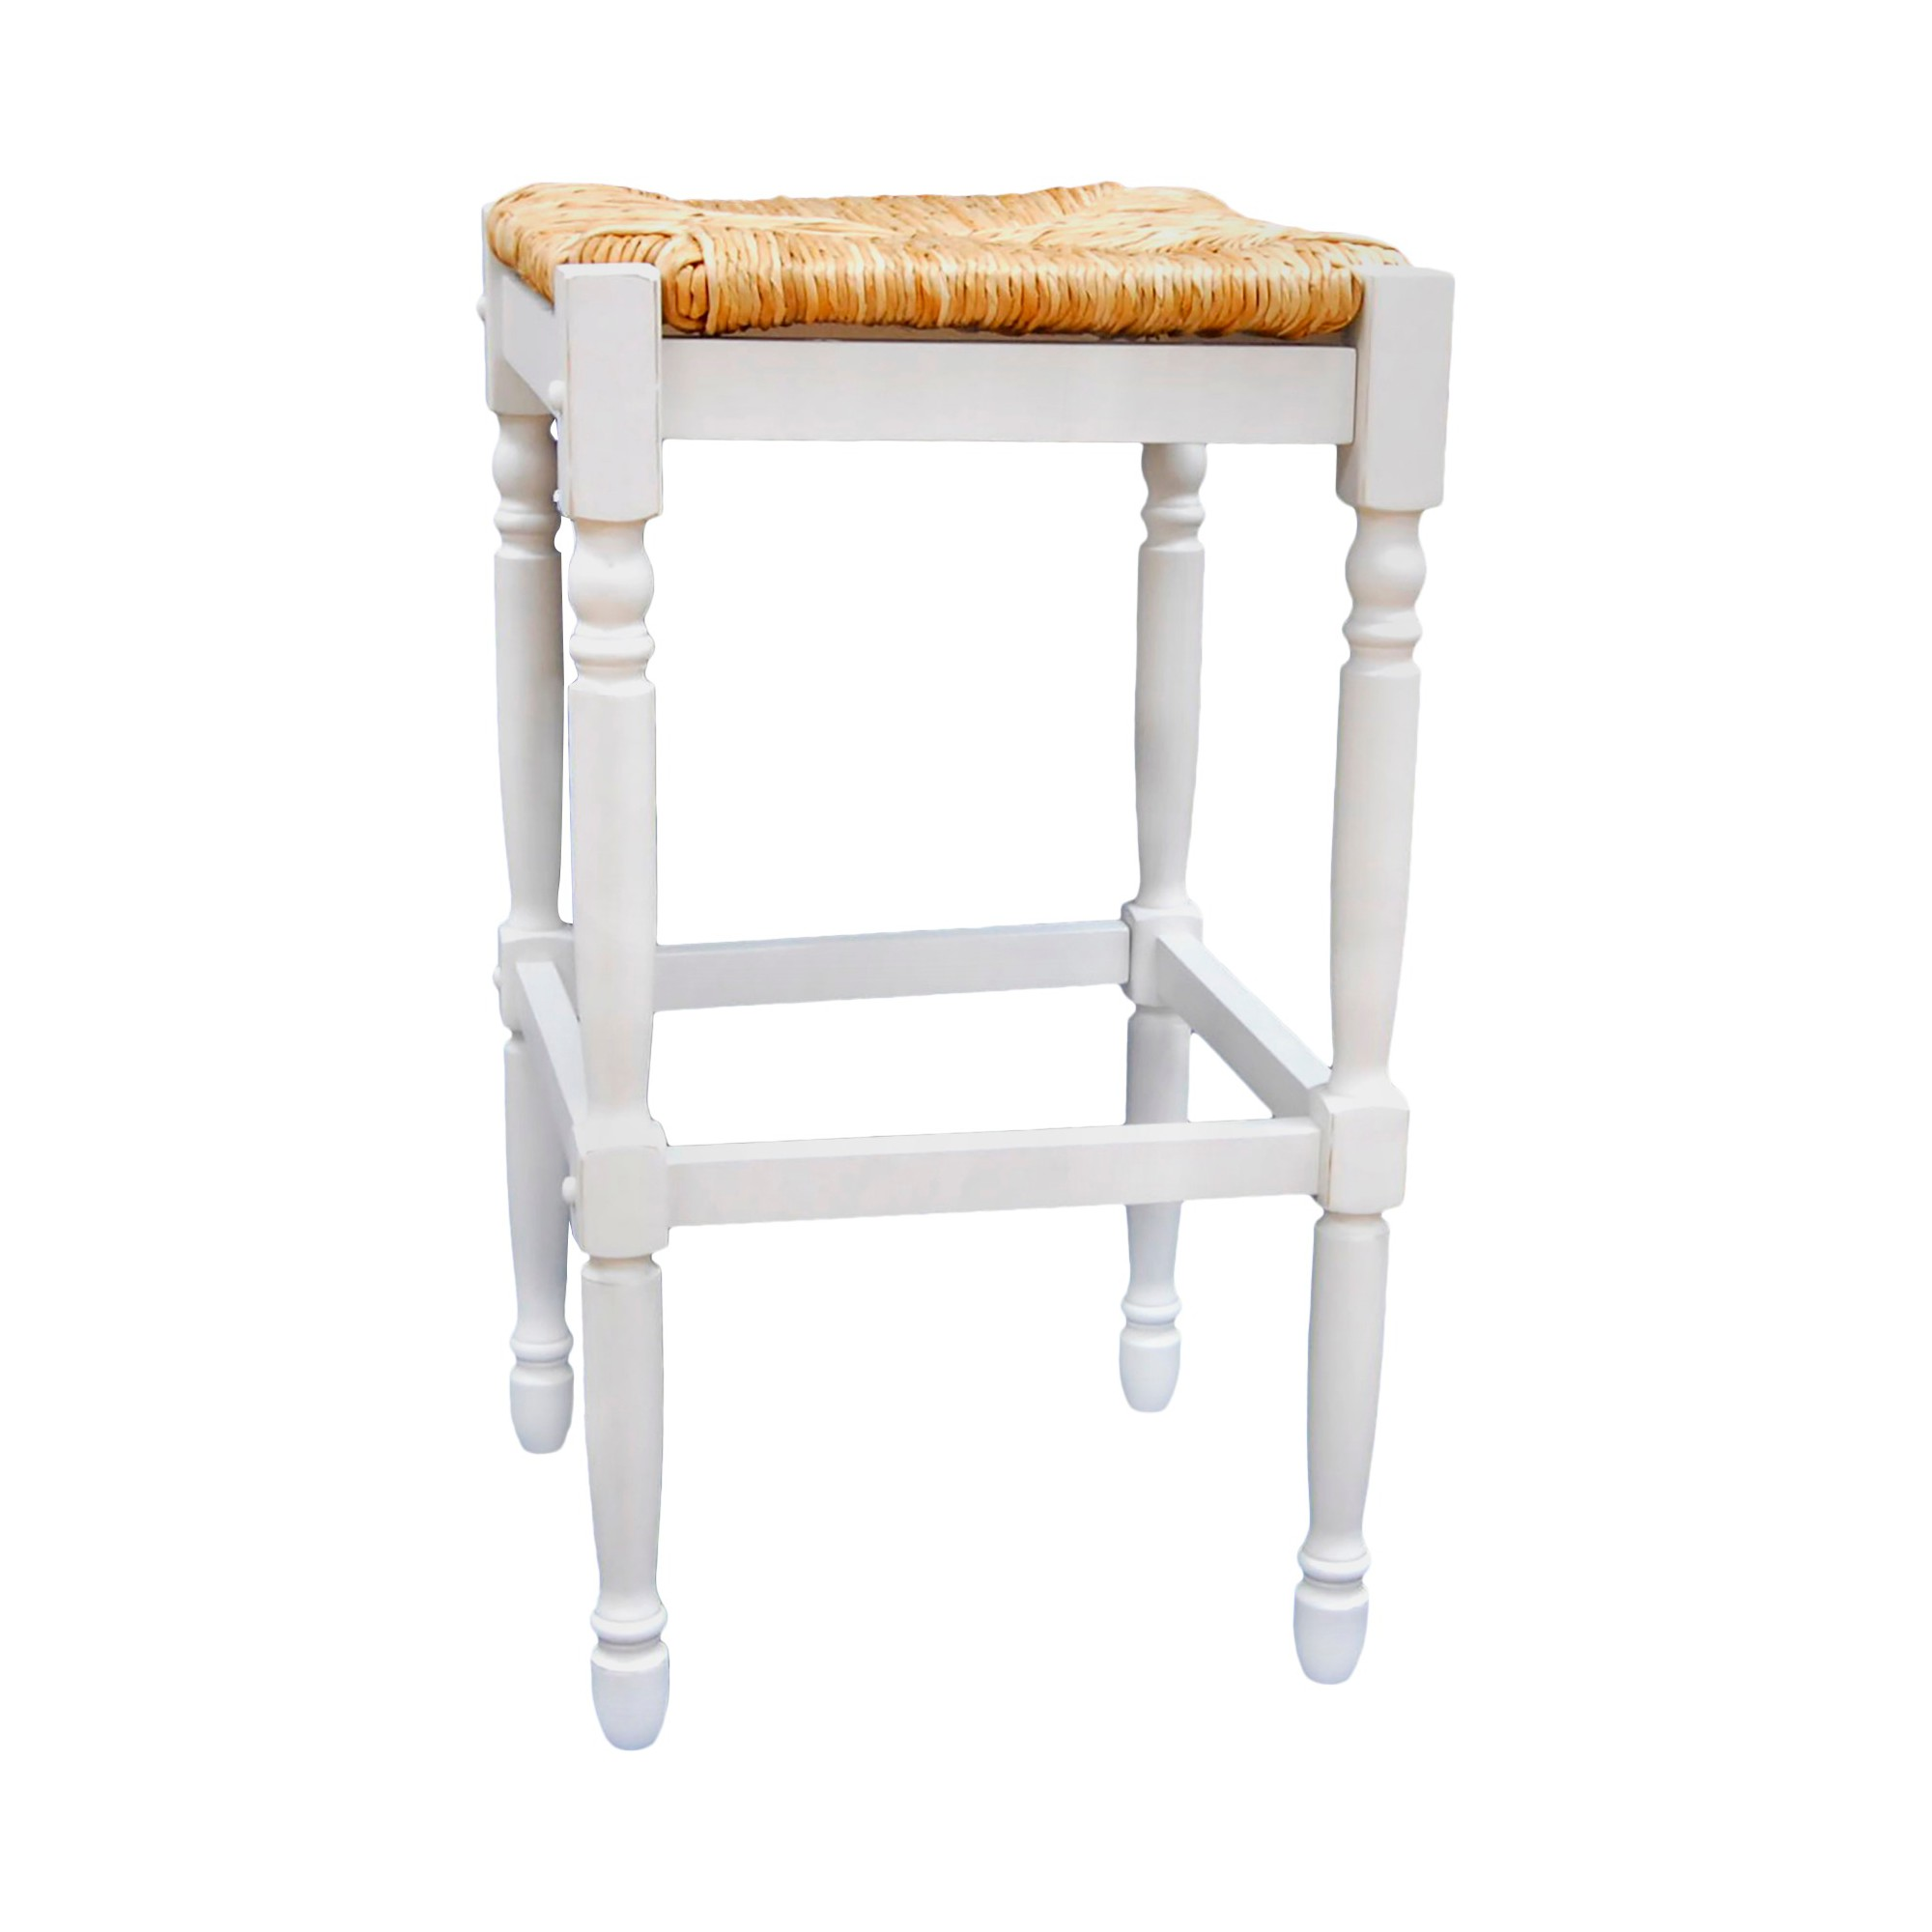 29.25 Turner Barstool Antique White - Carolina Chair and Table, Light Milk White